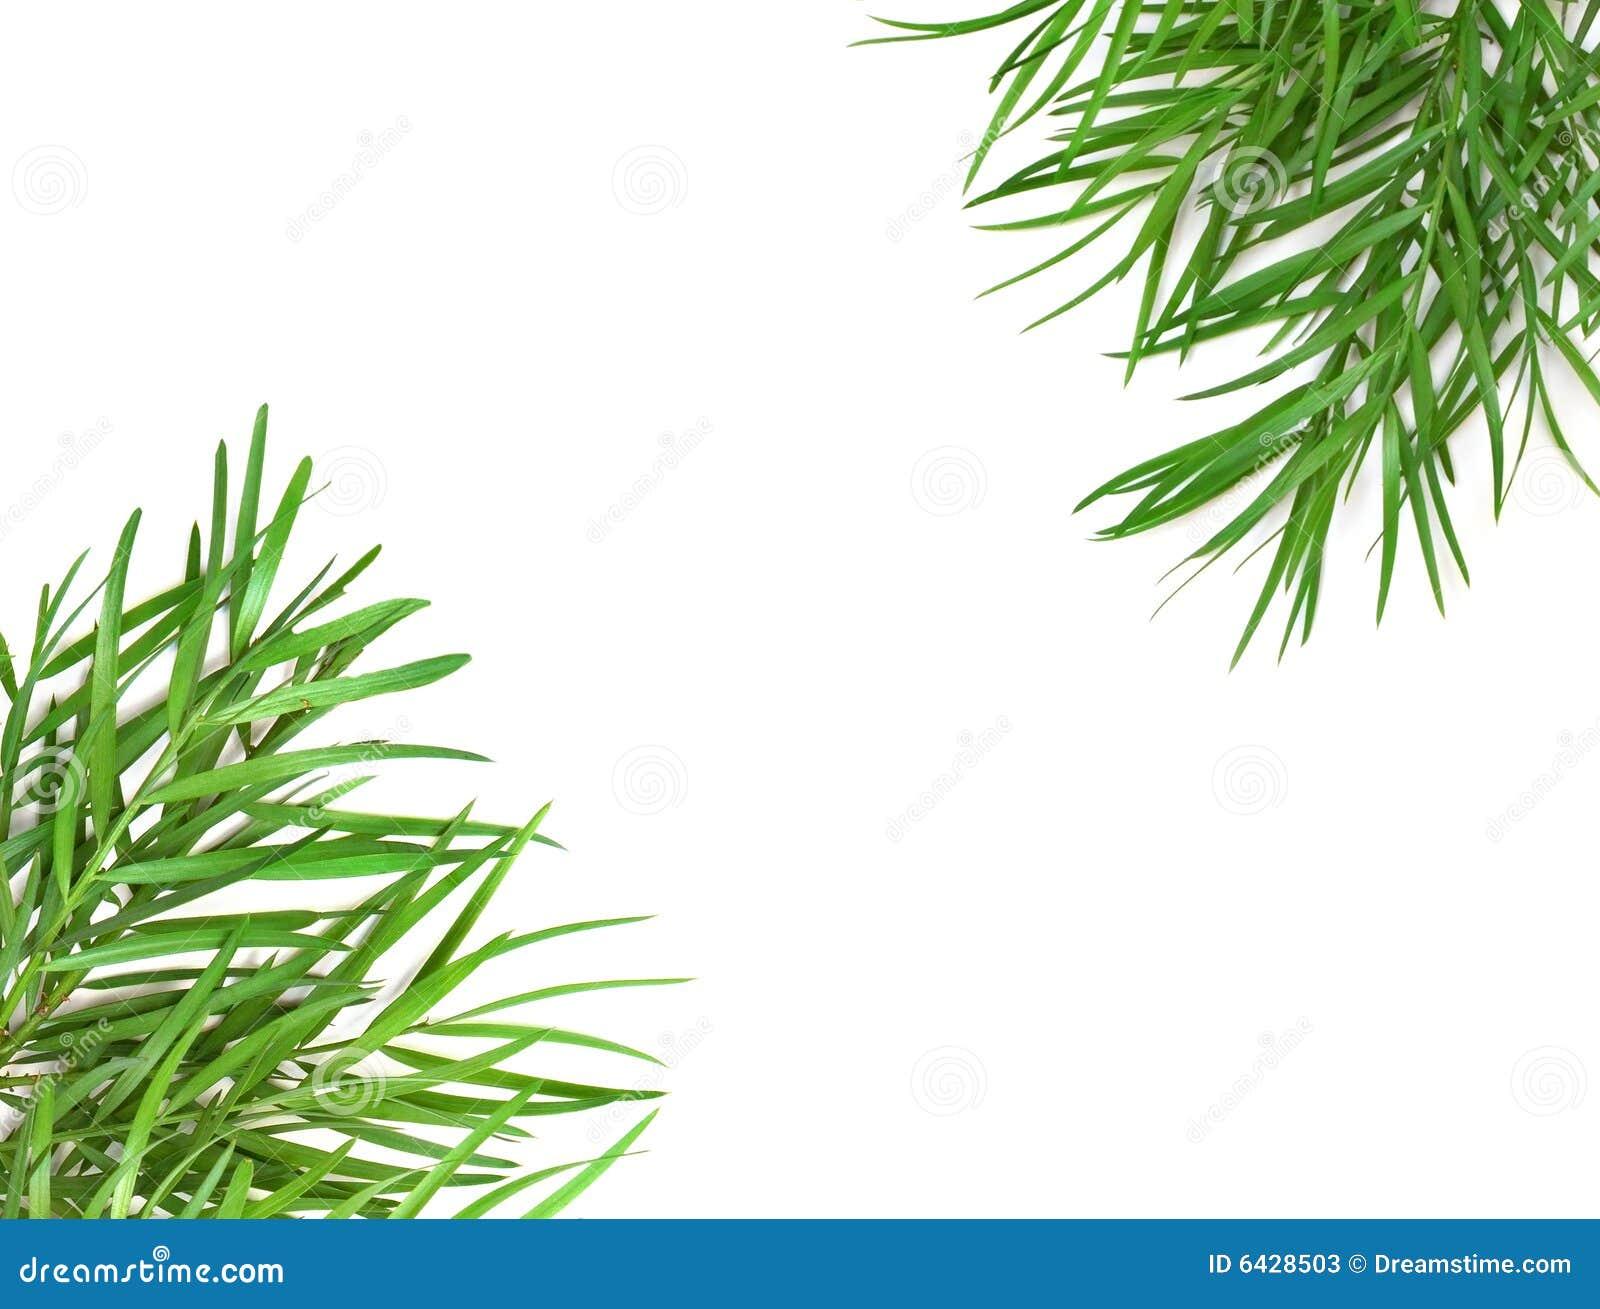 Stock Photos: Green leaf border. Image: 6428503